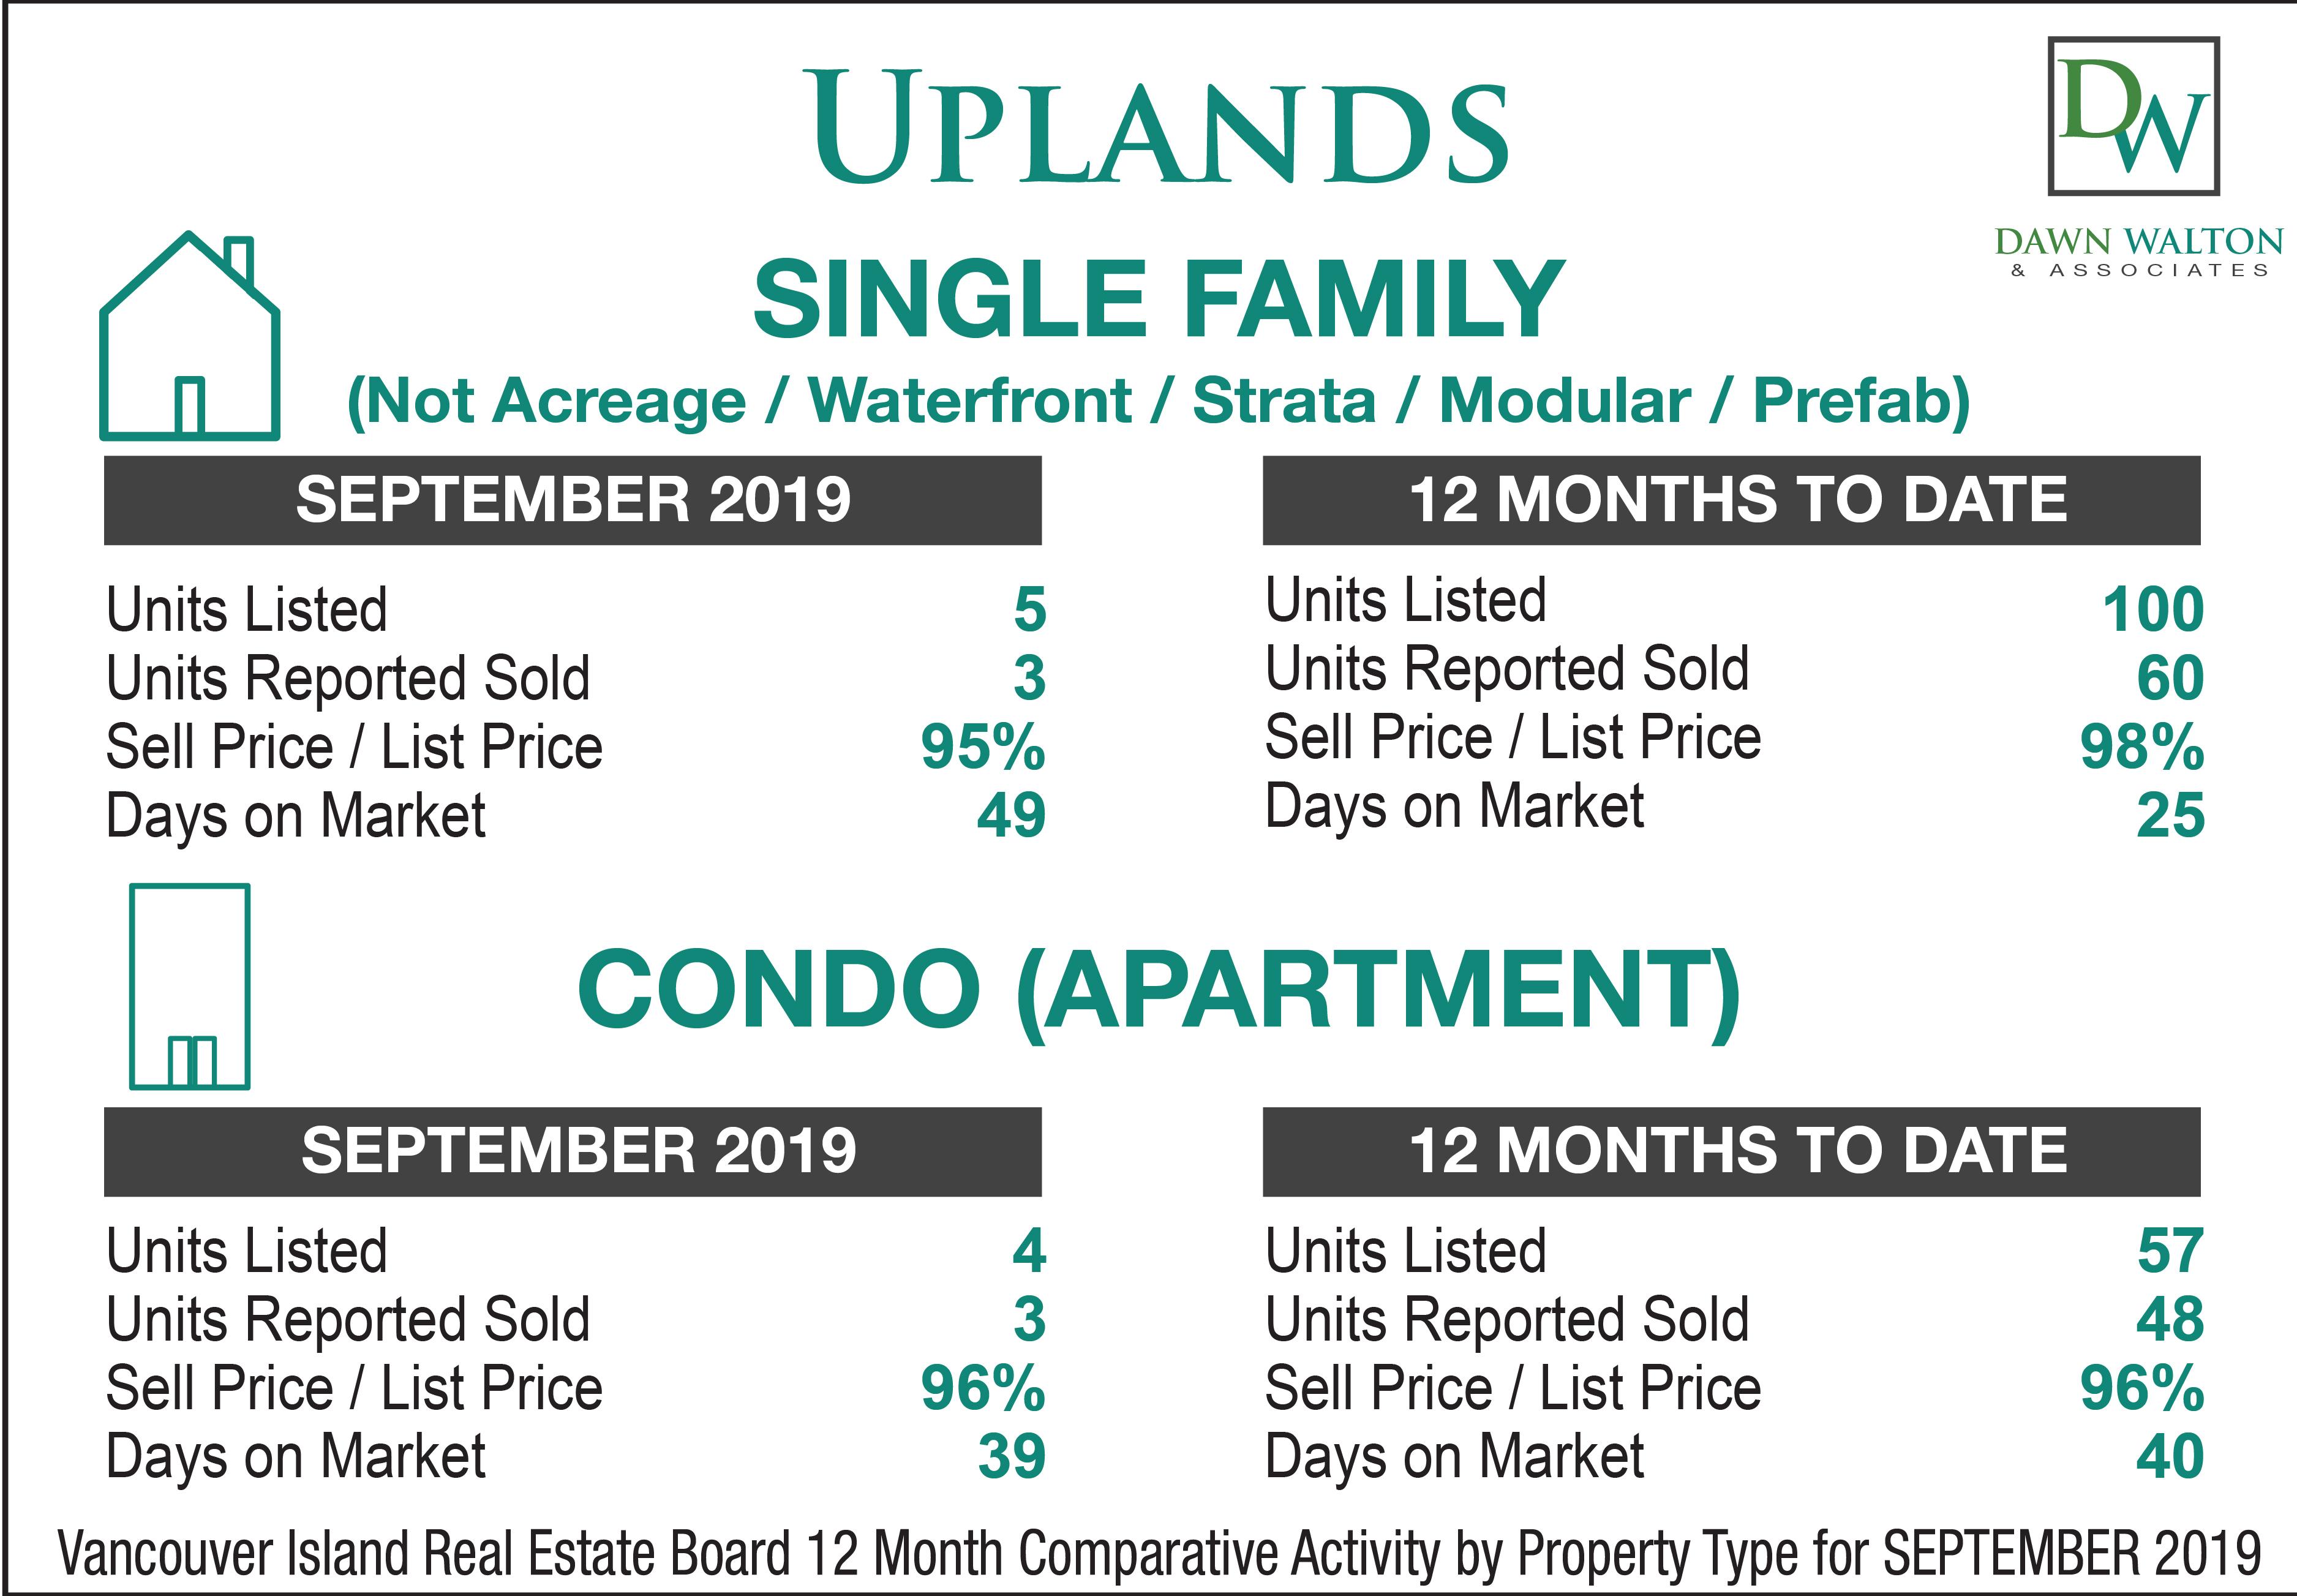 Uplands Community - Nanaimo Real Estate - Nanaimo Realtor Dawn Walton